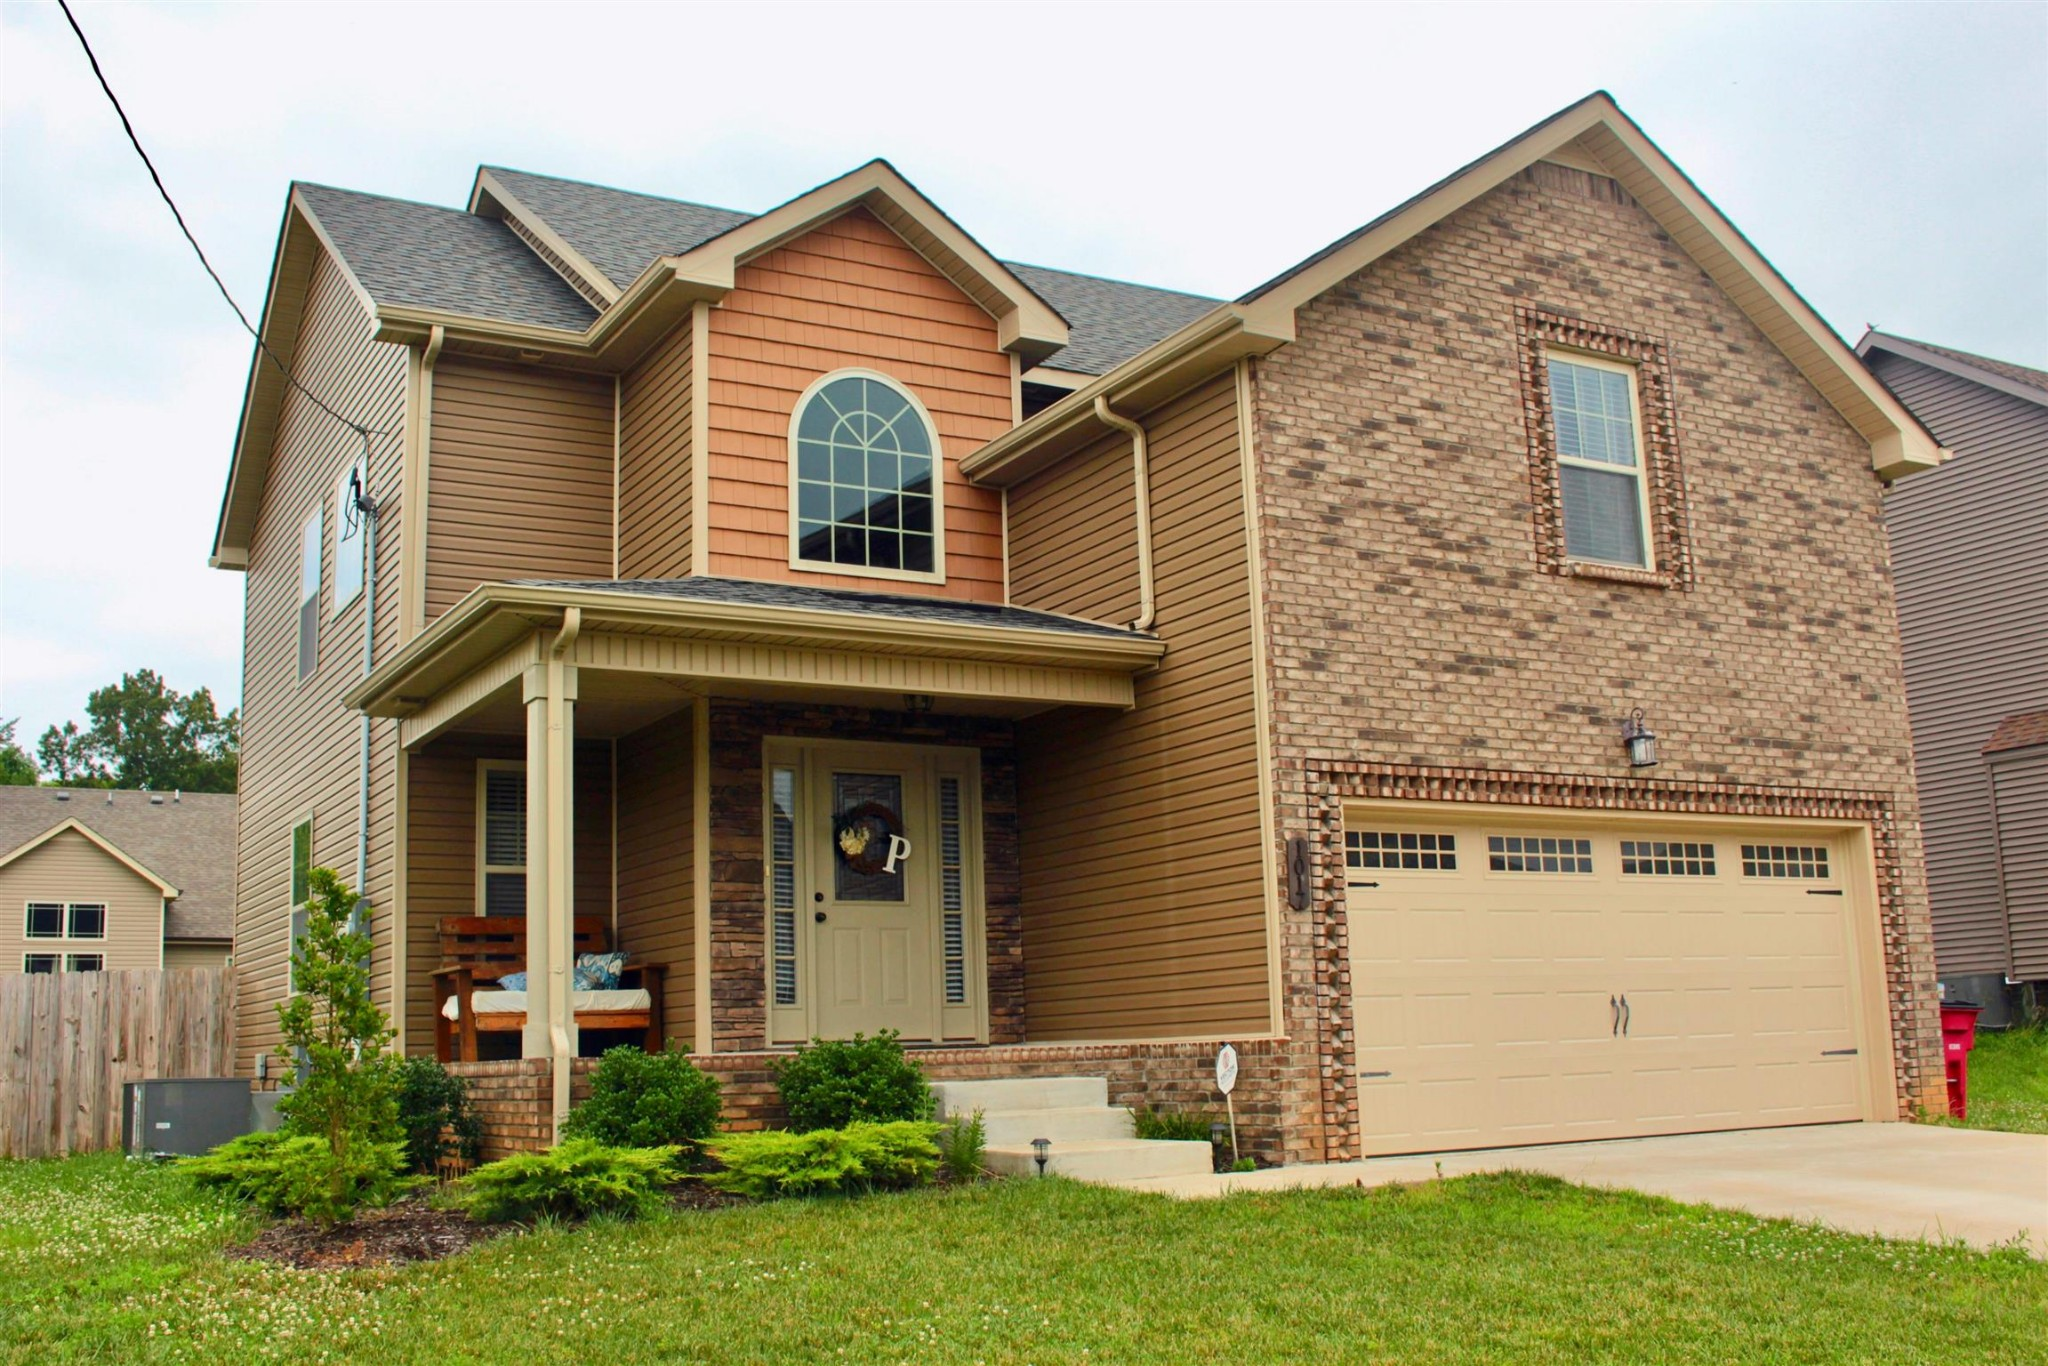 1017 Sunrise Dr Property Photo - Clarksville, TN real estate listing